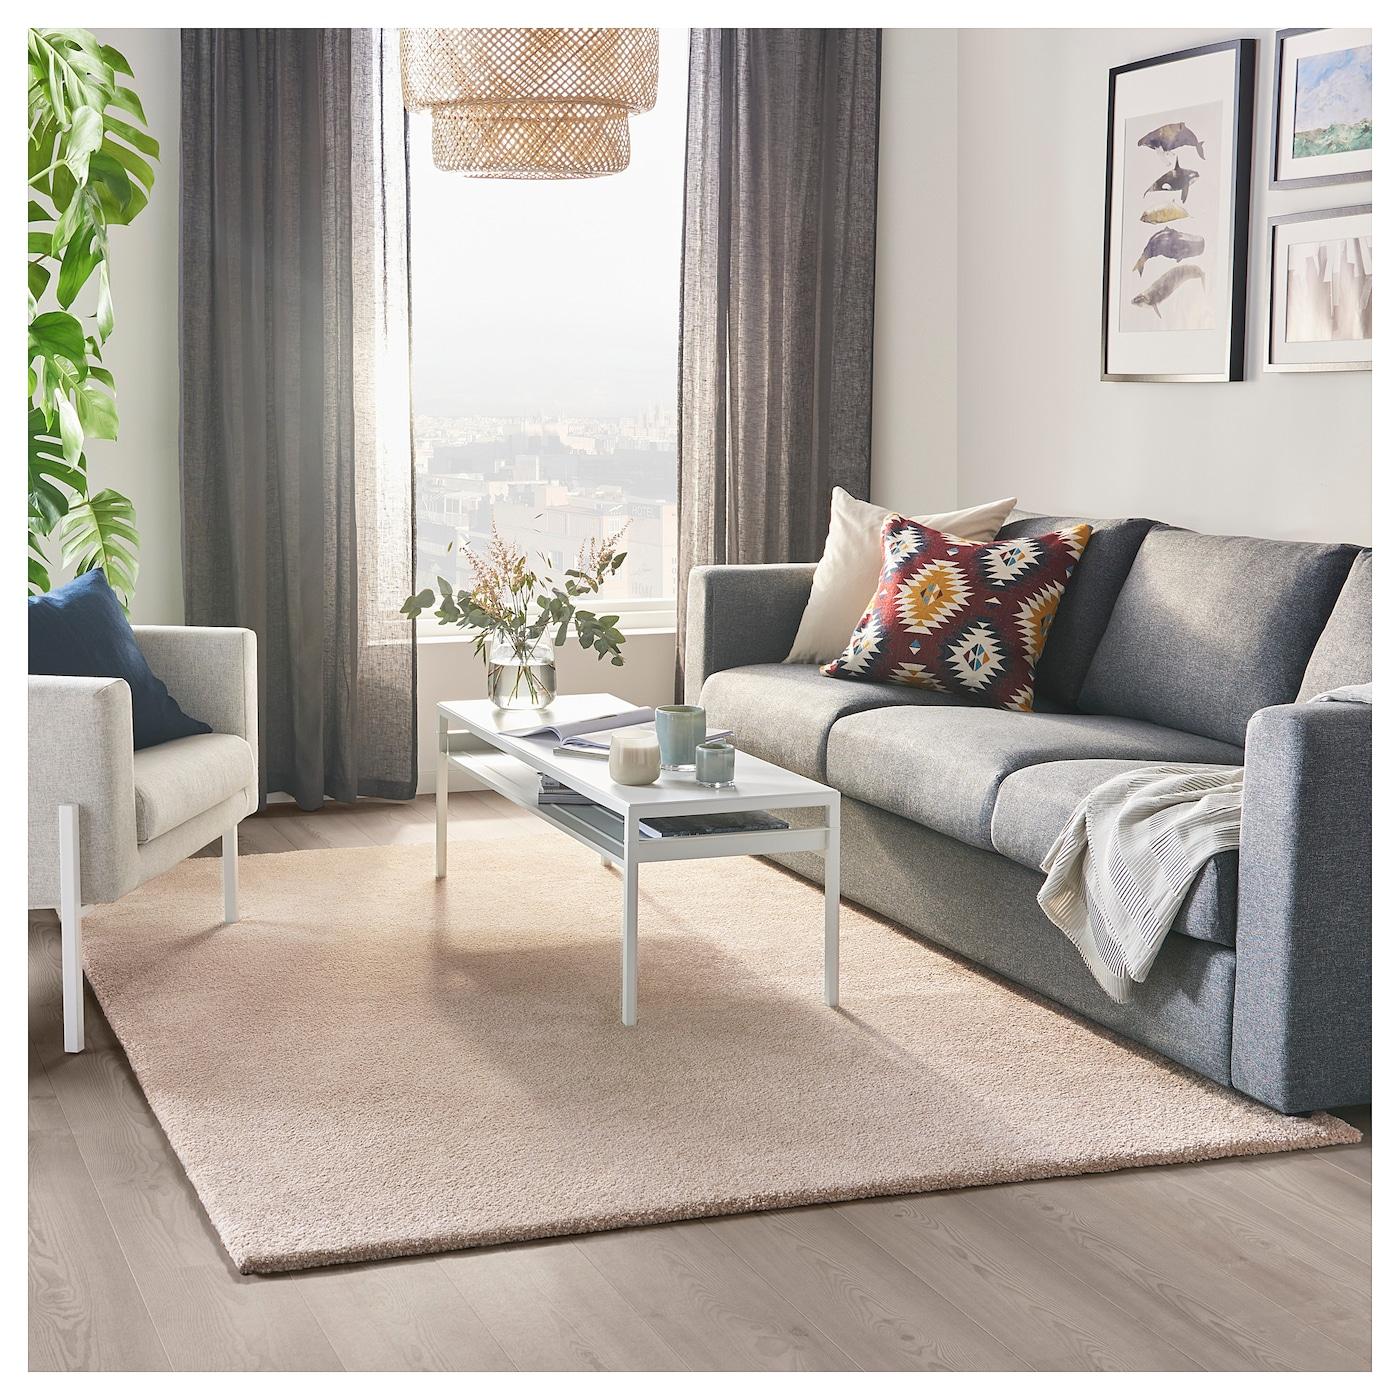 Ikea Off White Area Rug: STOENSE Rug, Low Pile Off-white 170 X 240 Cm